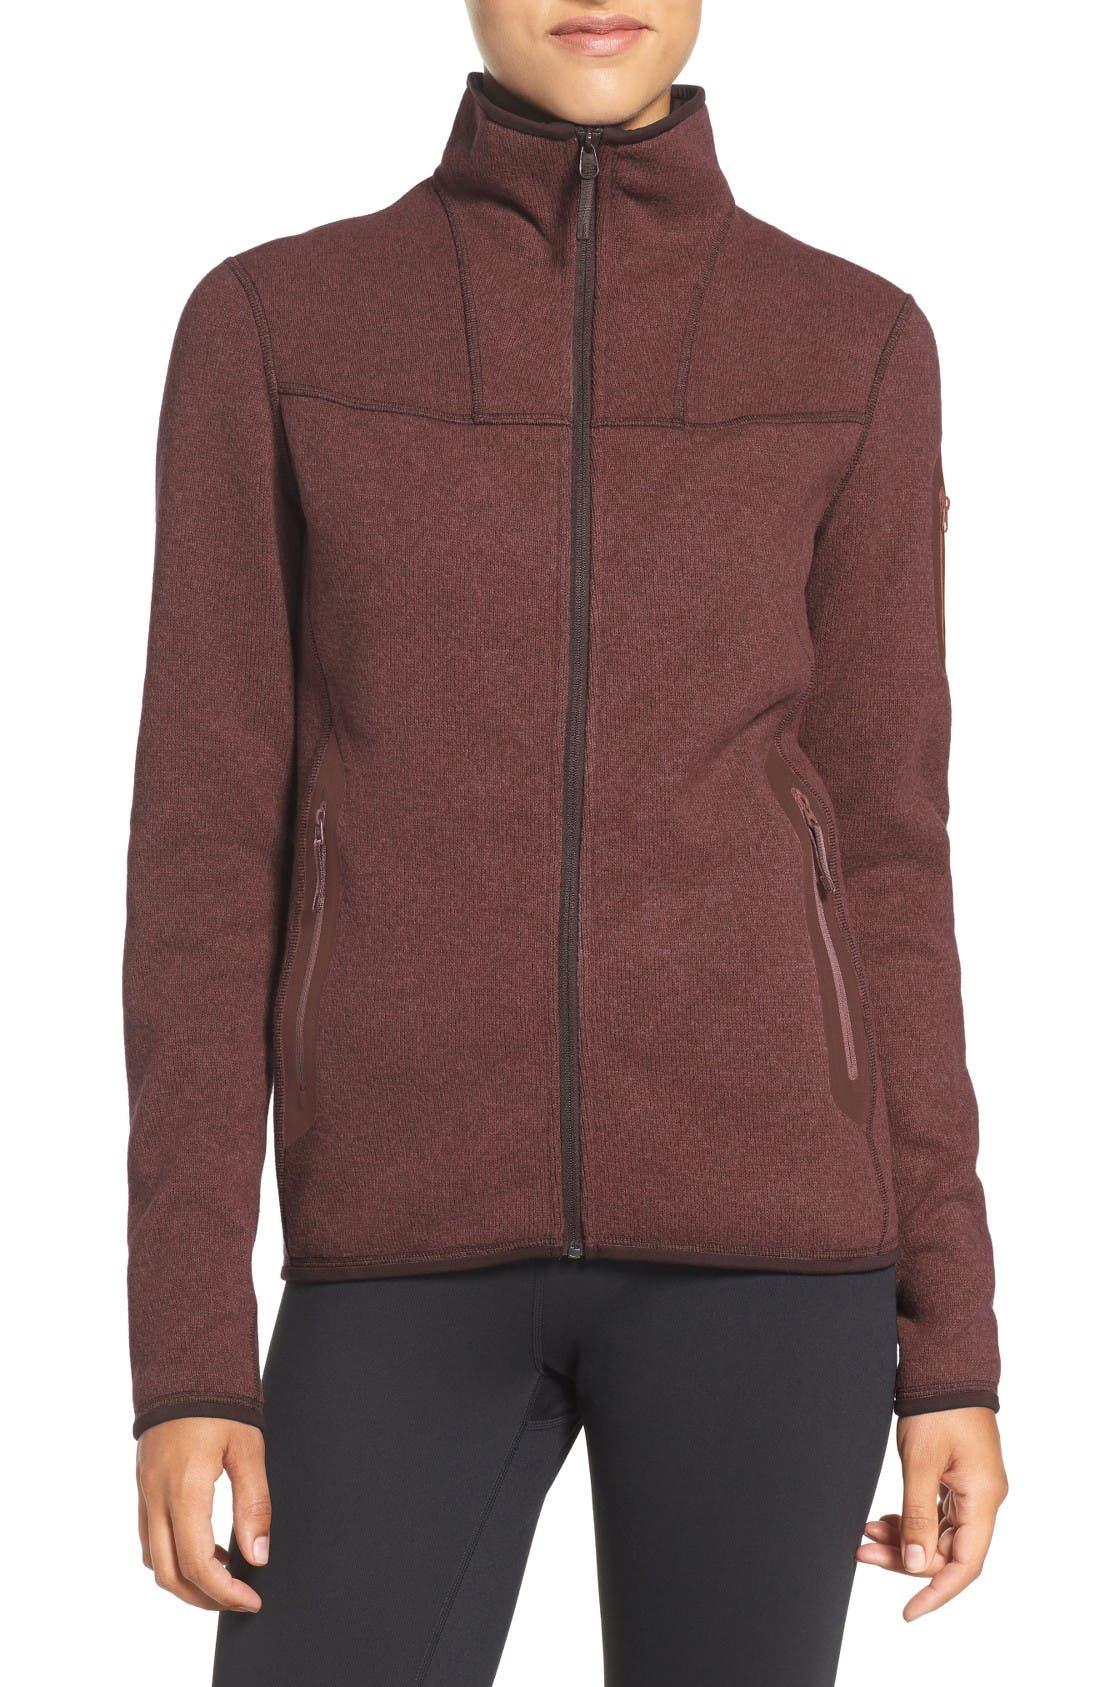 Covert Cardigan Fleece Jacket,                         Main,                         color, 200